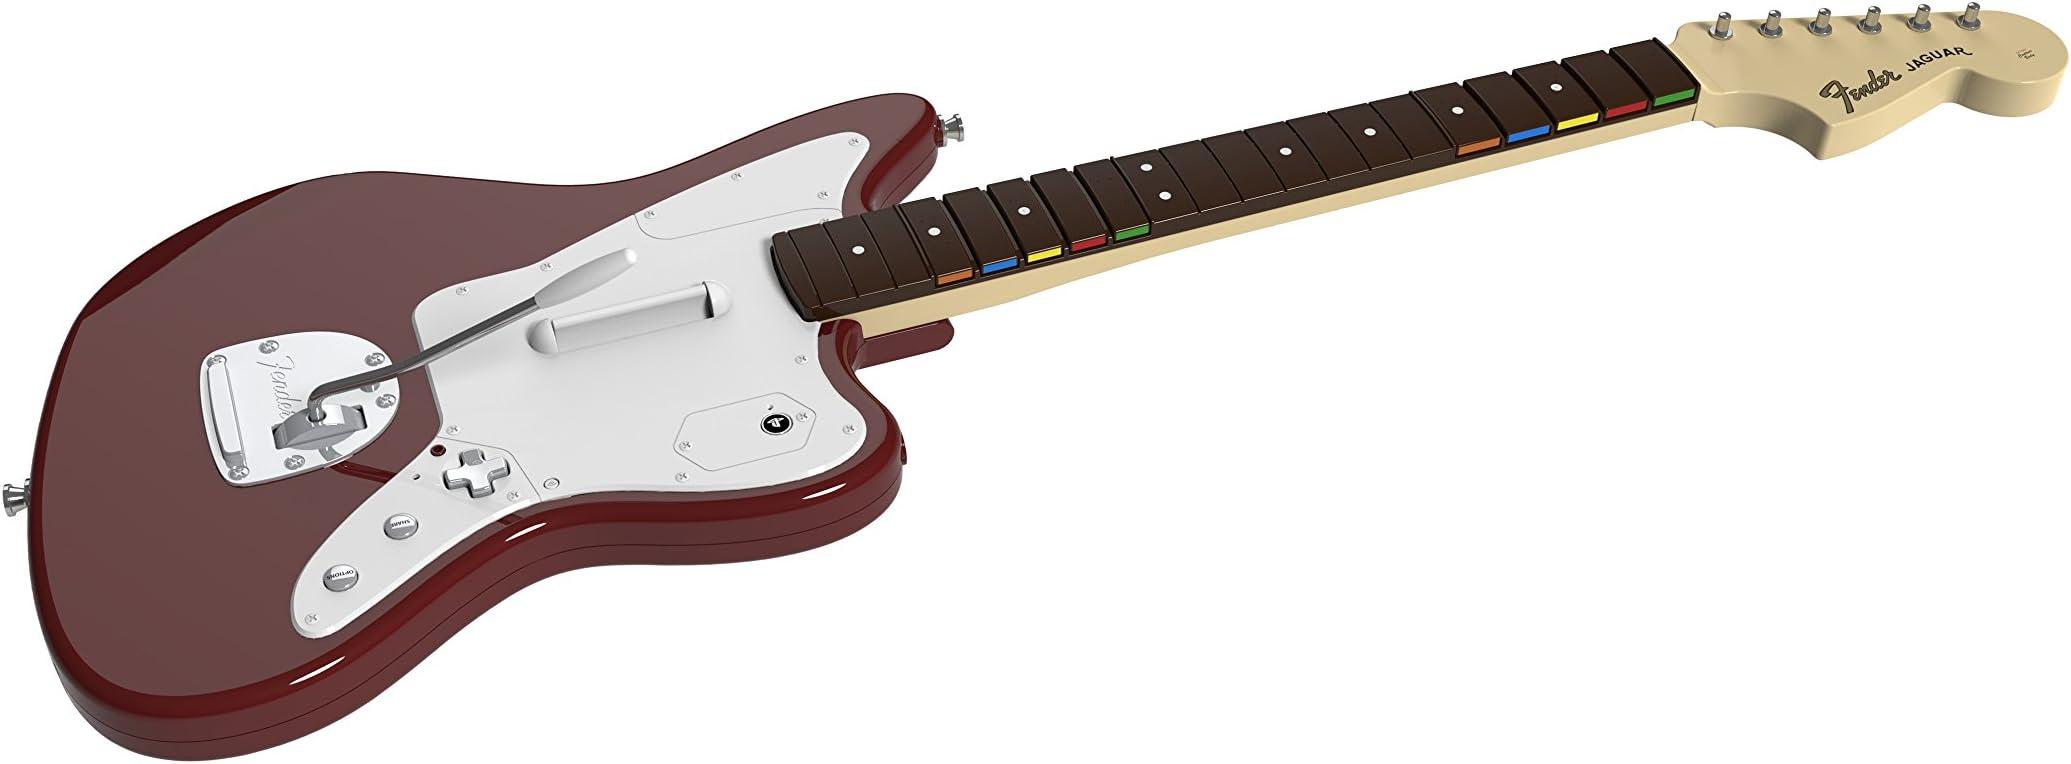 harmony guitar it fender worth acapella central whats jaguar forum